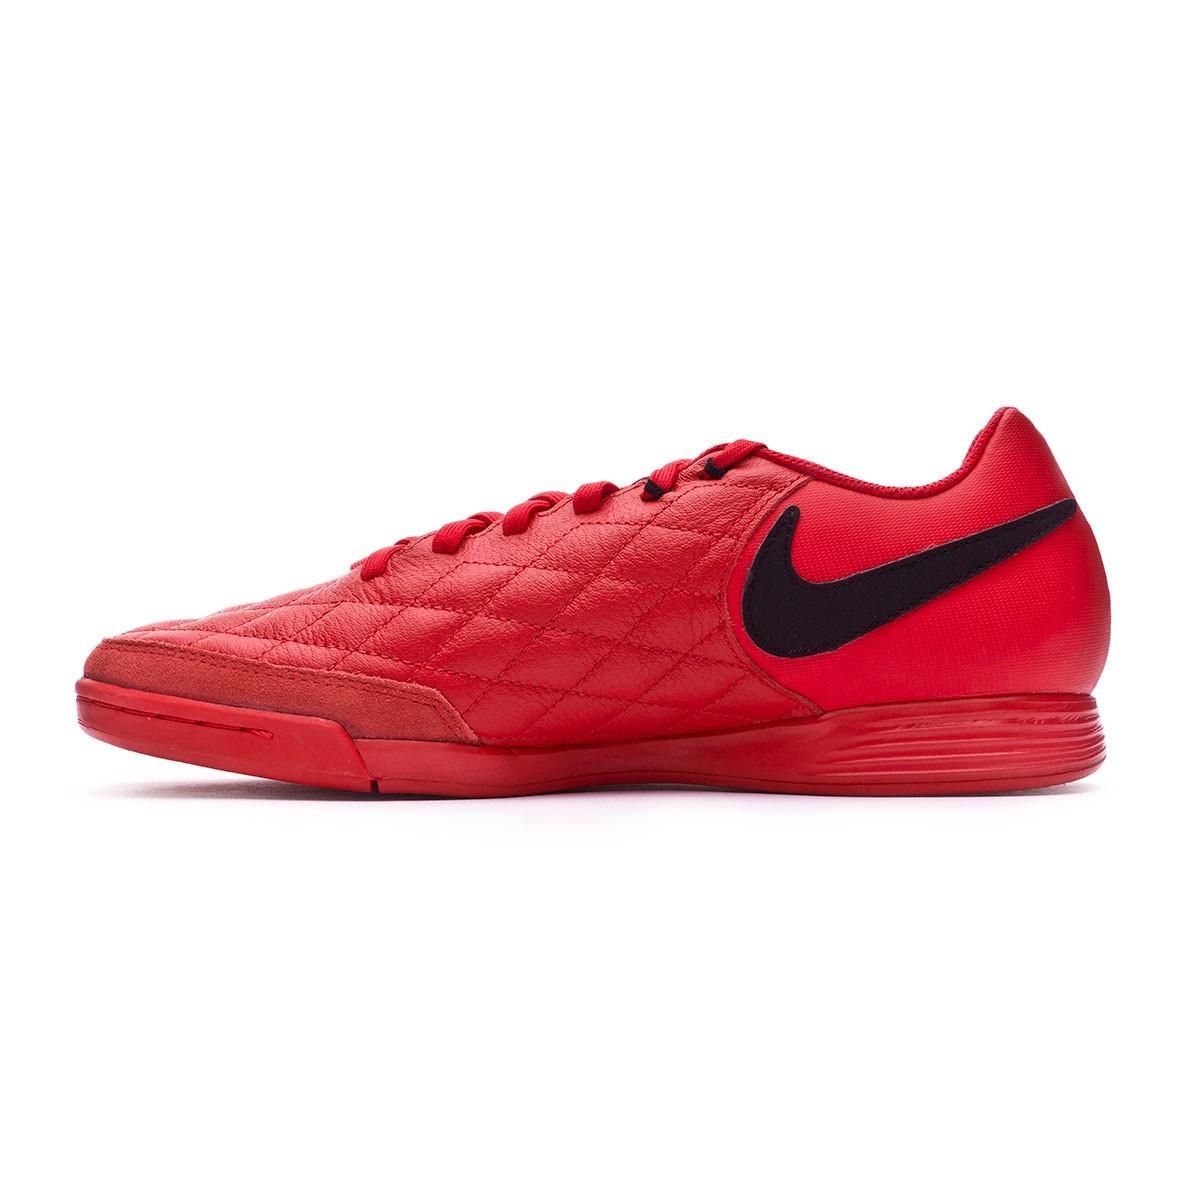 4612935ce97 Futsal Boot Nike LegendX VII Academy 10R IC University red-Black-Metallic  gold - Tienda de fútbol Fútbol Emotion